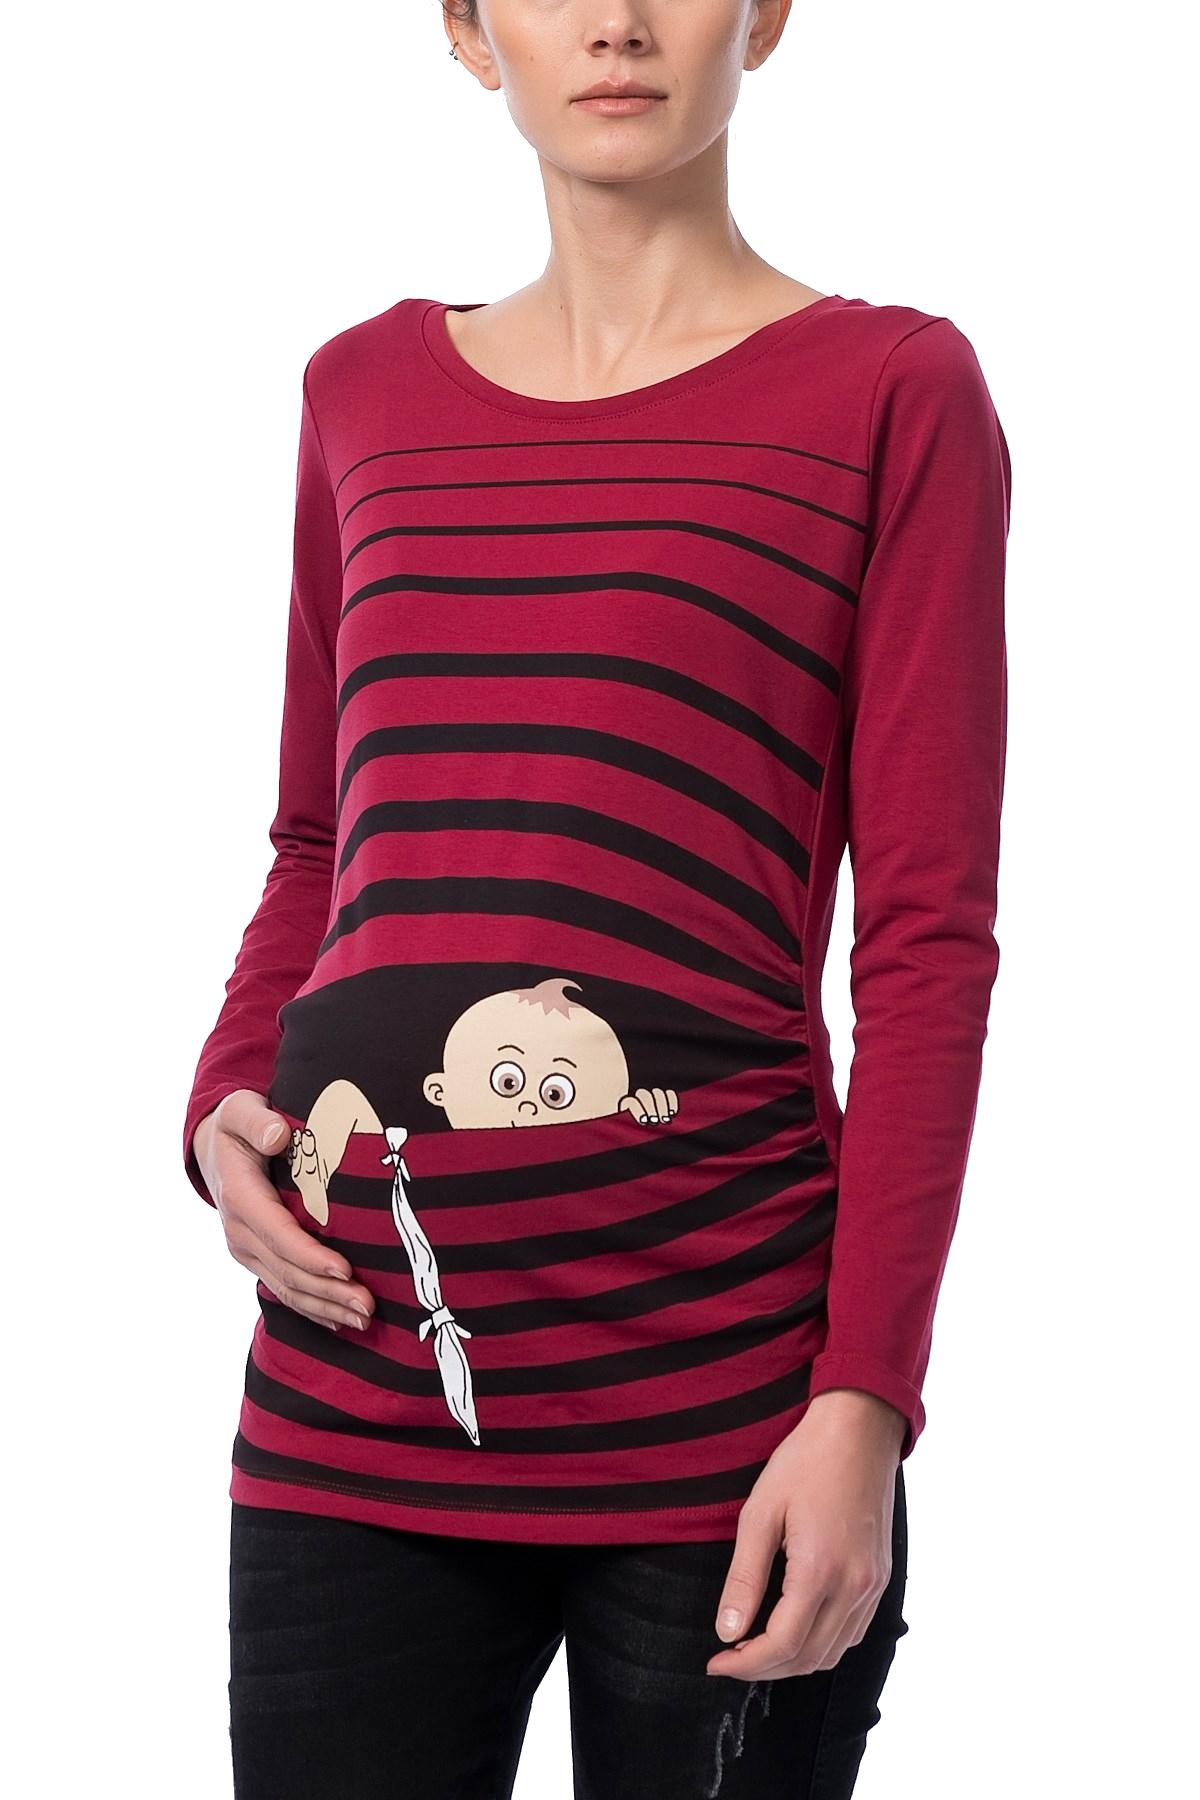 MAMIMODE Tričko s motívom Baby Flucht Dark Red